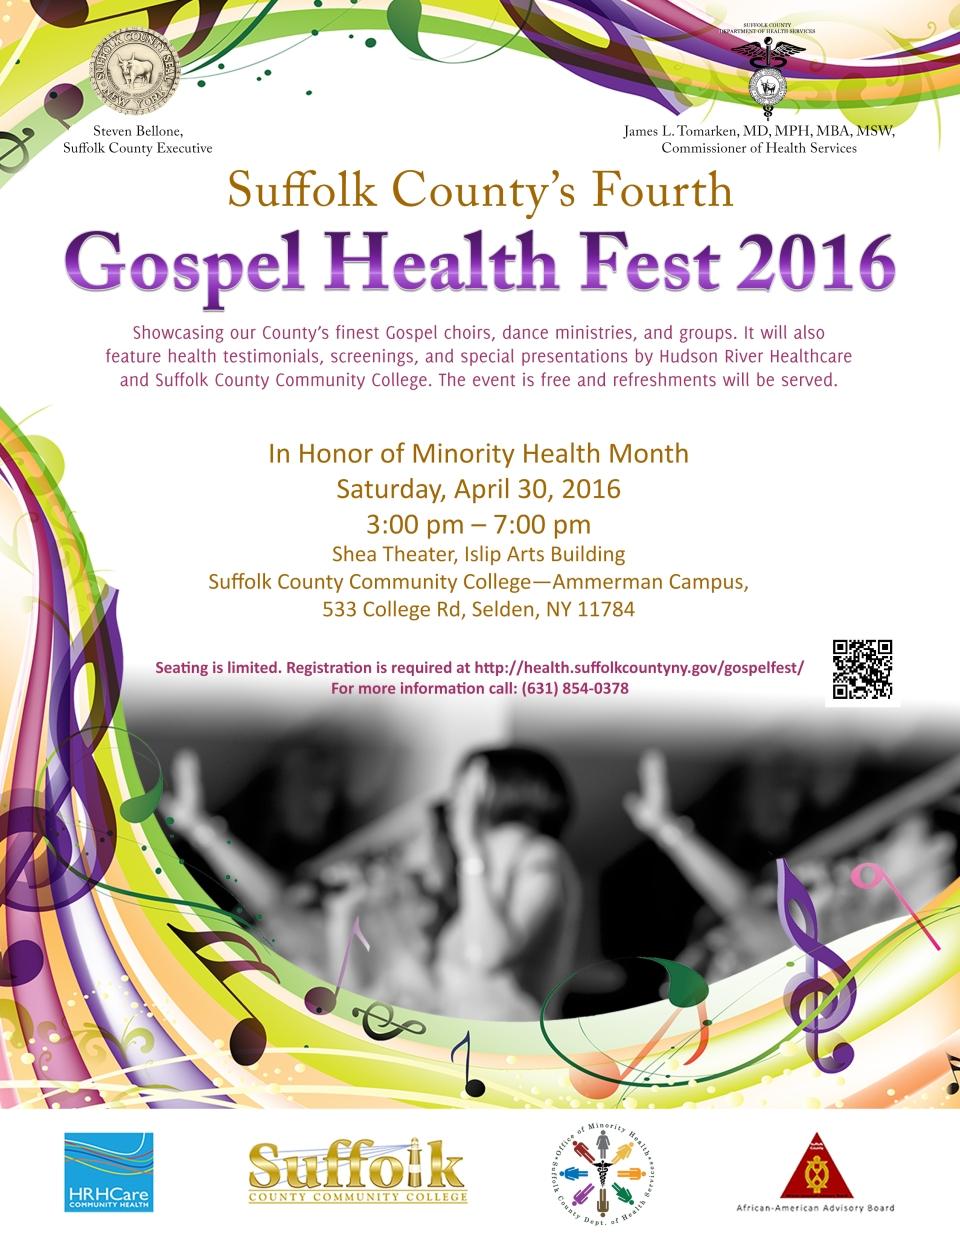 GHfest2016